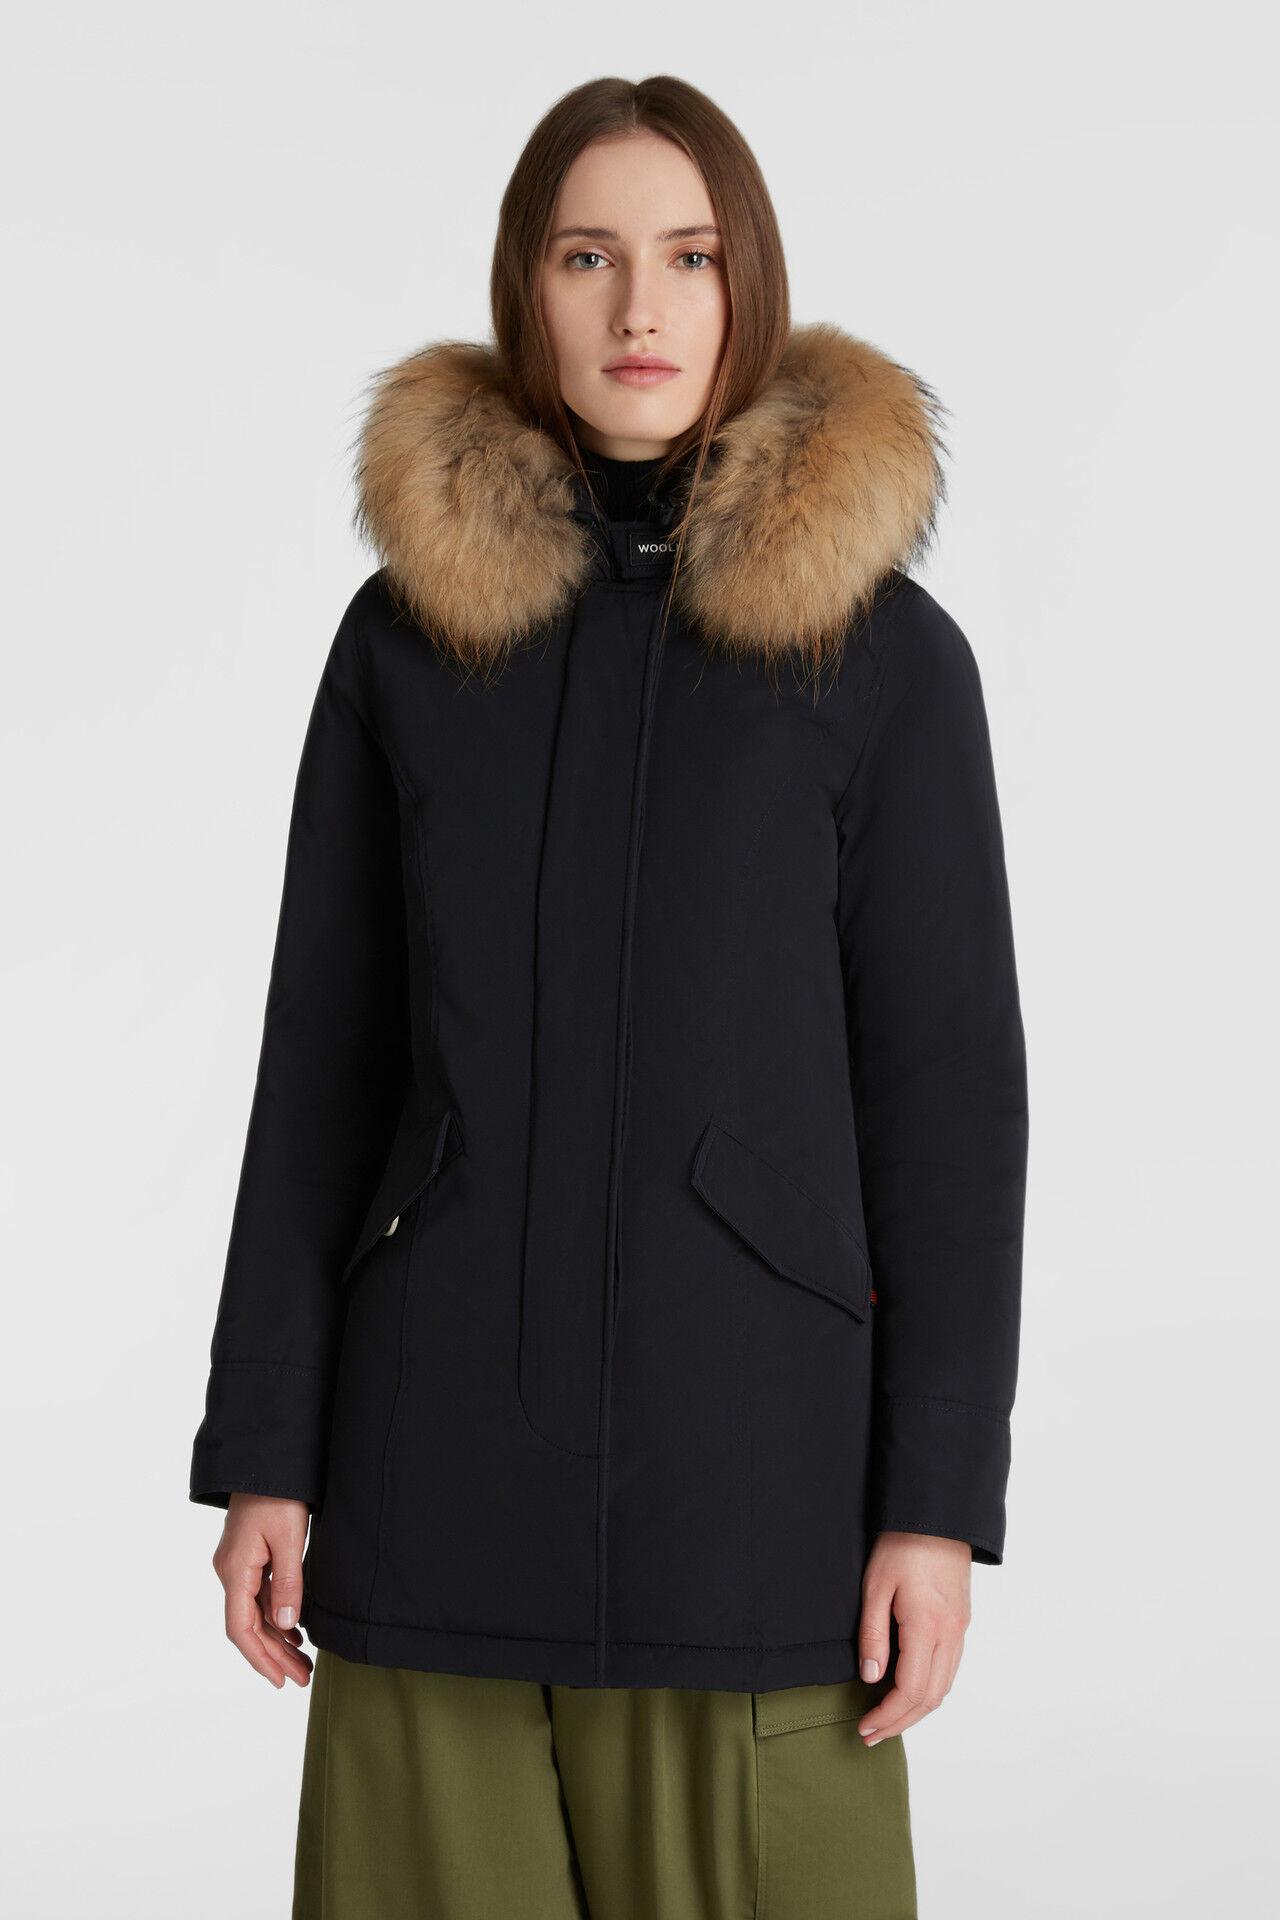 Arctic Parka Luxury Pelliccia Racoon - Woolrich